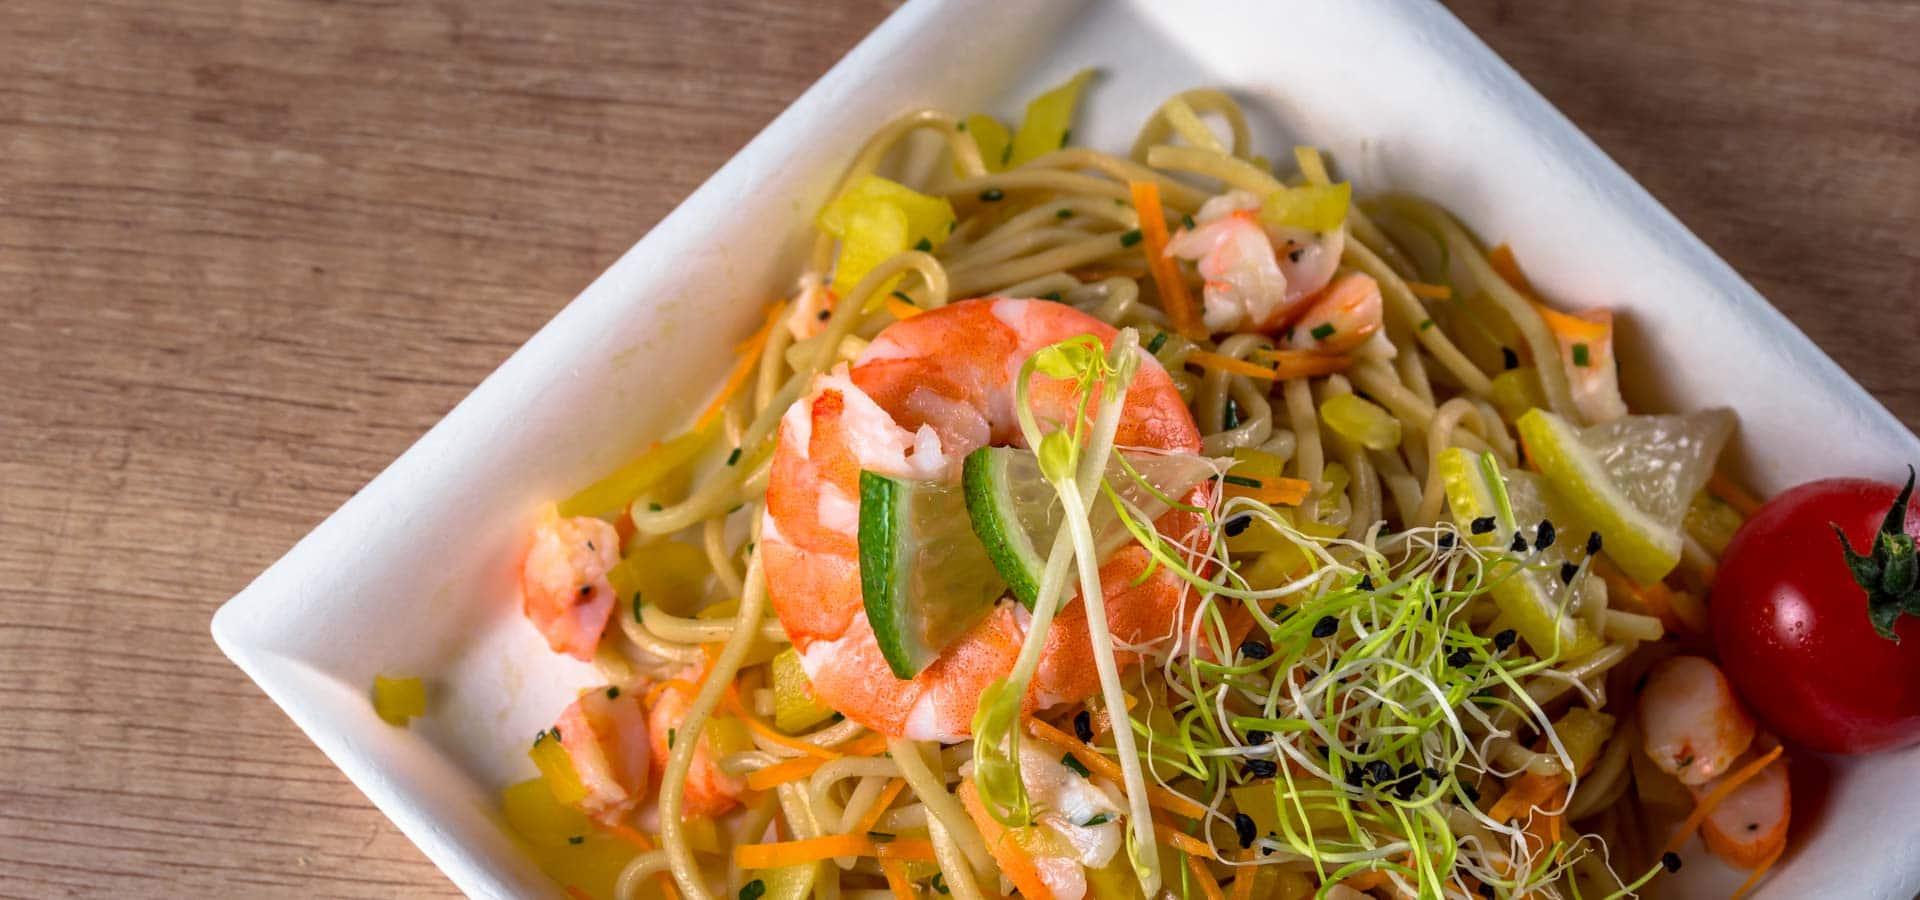 salade-composee-variee-restaurant-potofeu